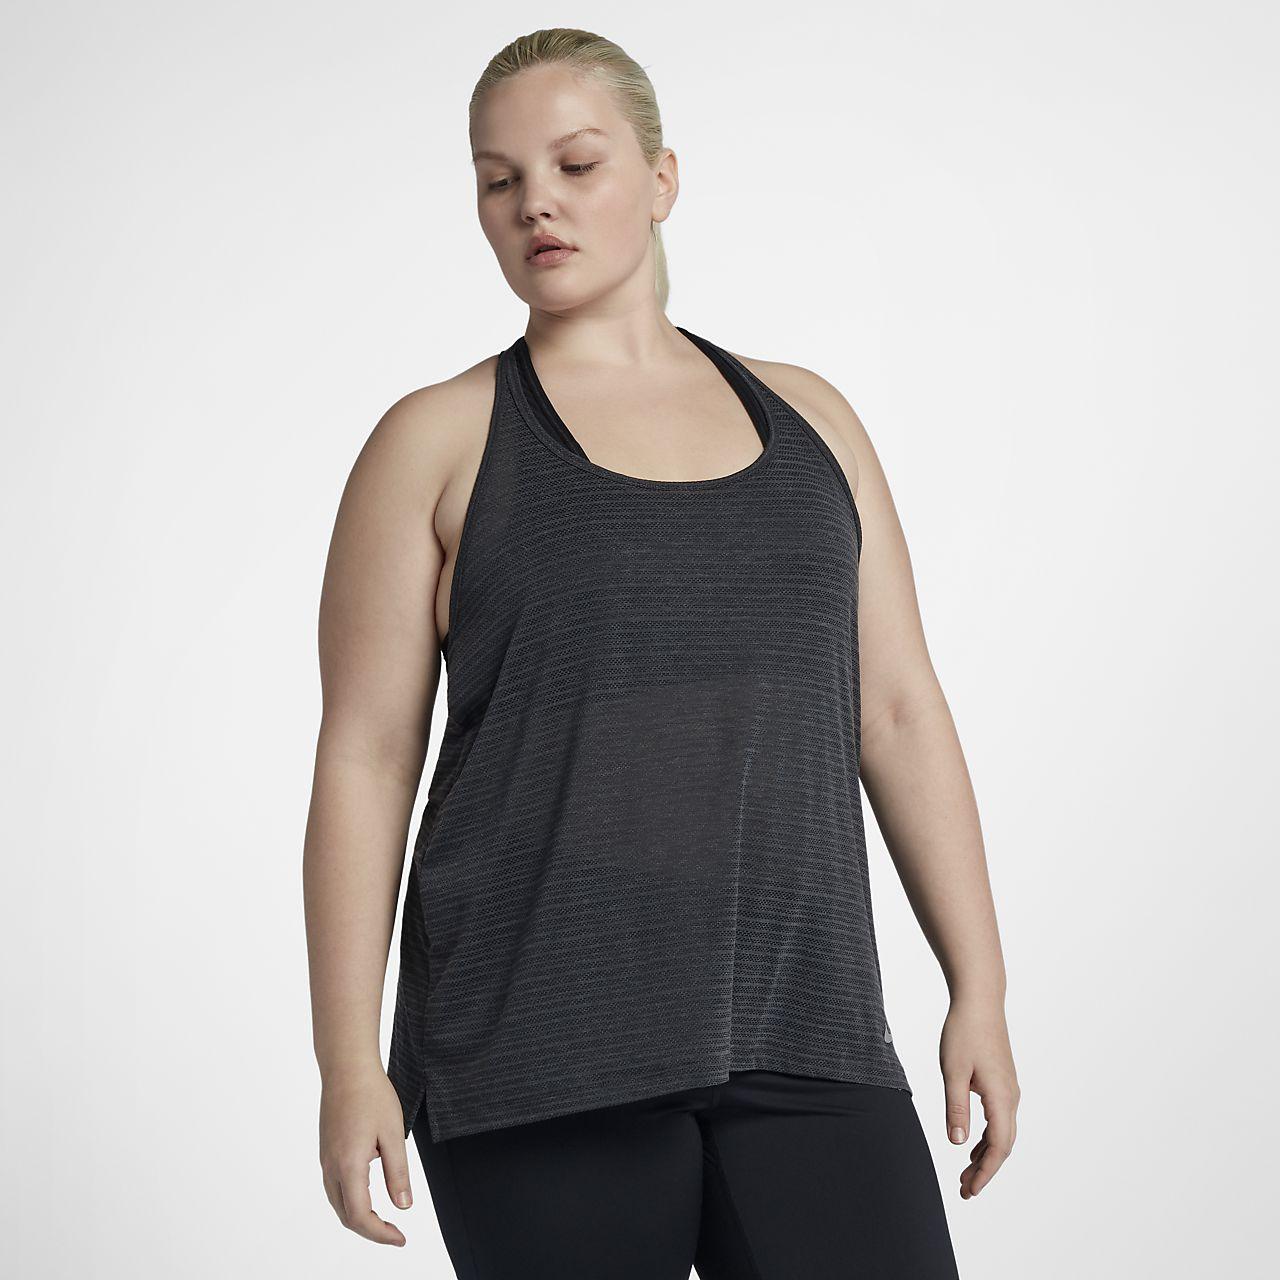 reputable site da272 4b915 Women s Running Tank. Nike Miler